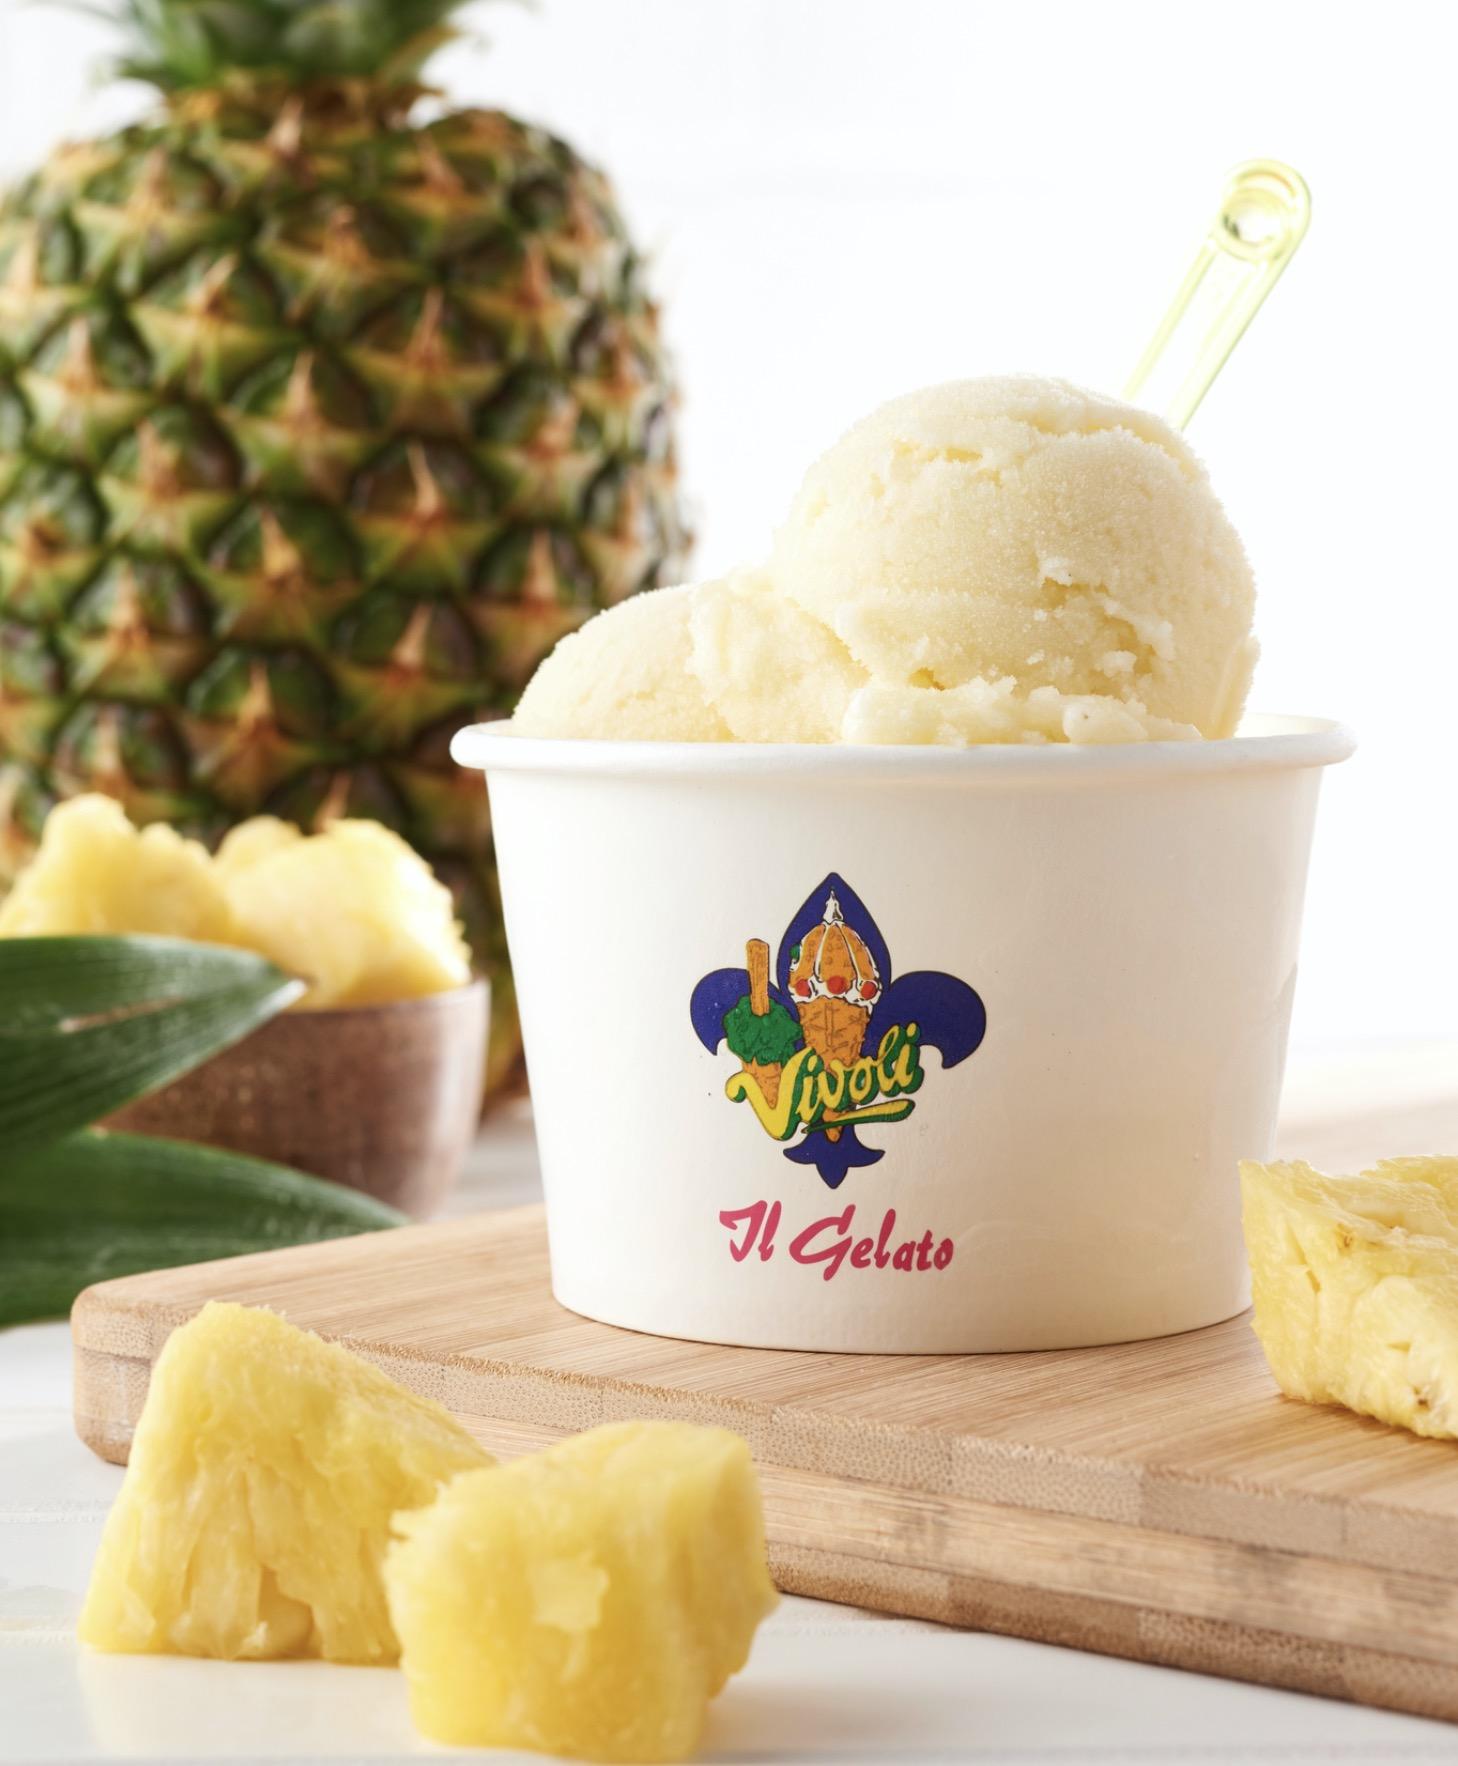 Vivoli it Gelato at Disney Springs Brings Back their Popular Cannoli Shake & Pineapple Sorbet